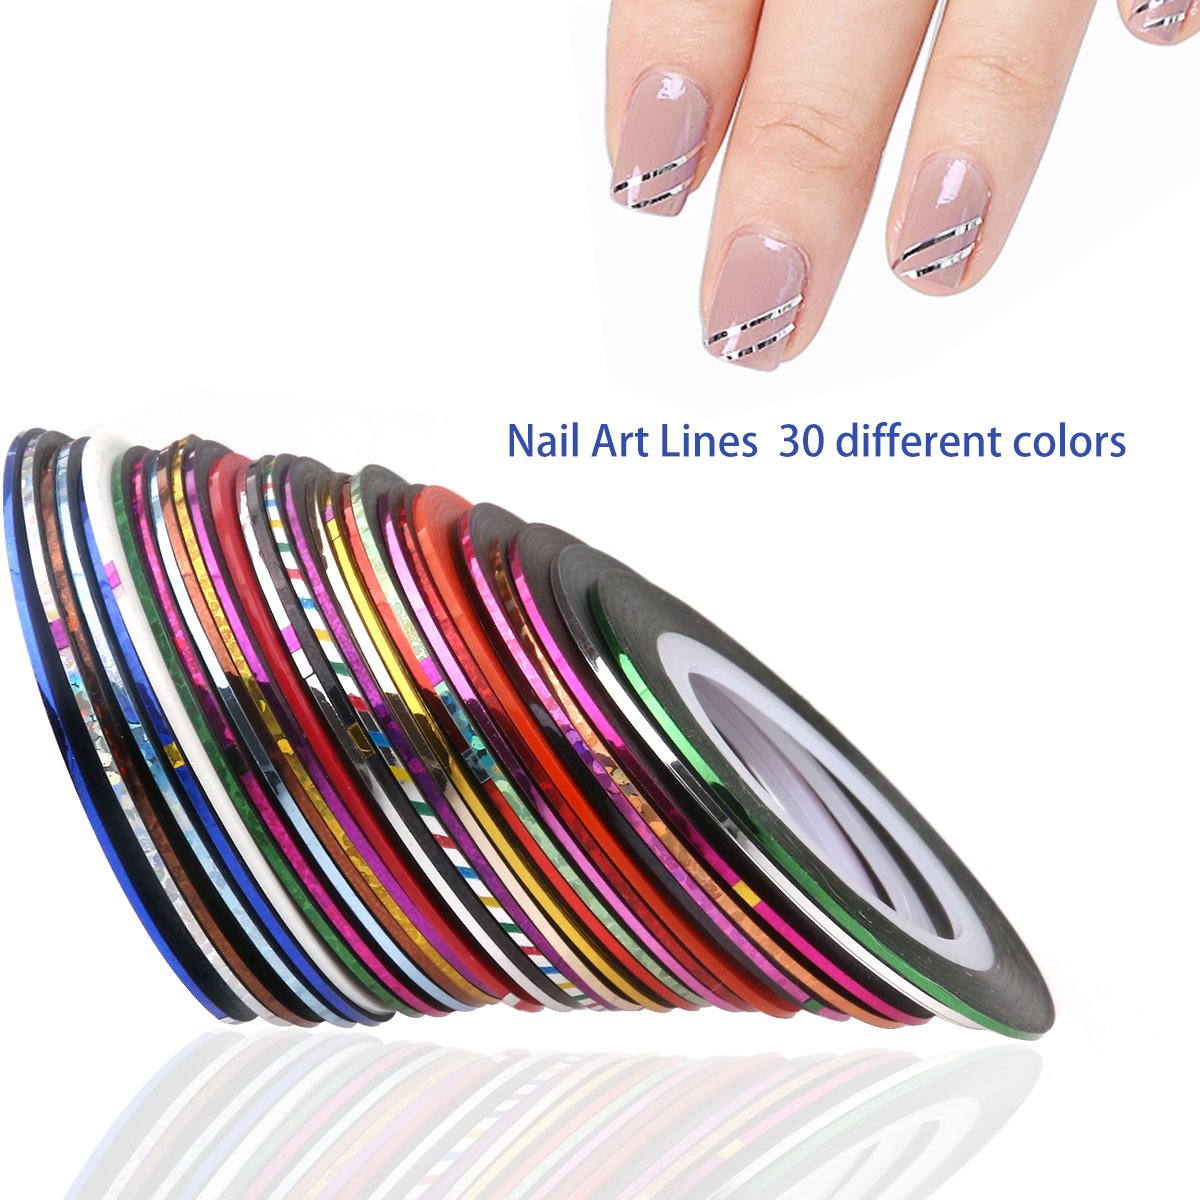 Amazon.com : RUIMIO 30 Nail Striping Tape, 15 Nail Art Brush, 12 ...